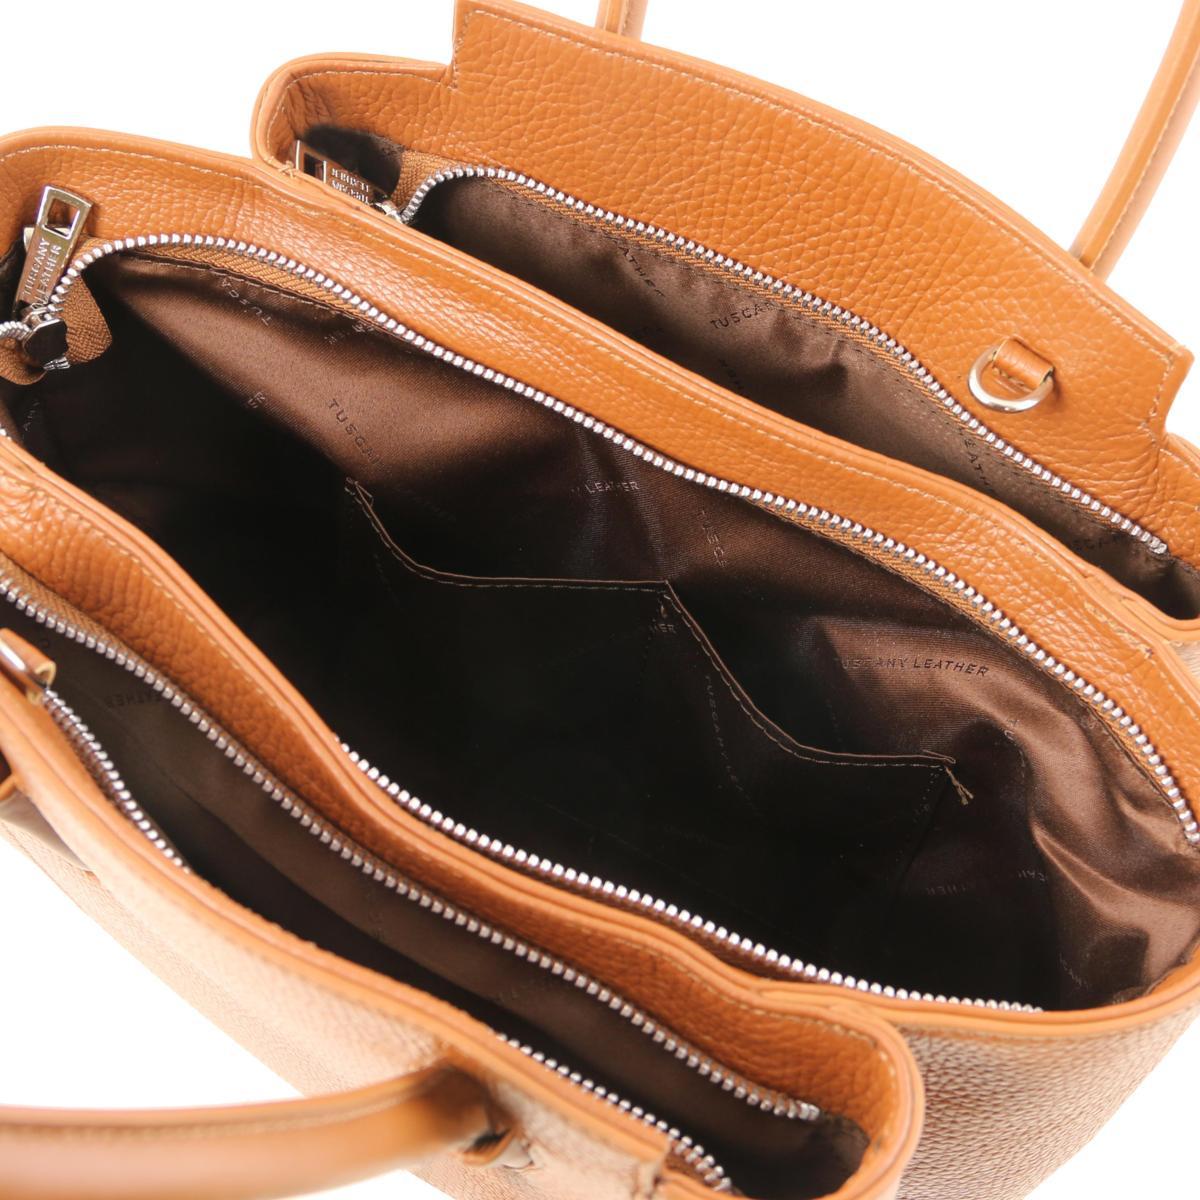 Sac à Main Cuir Souple Femme Camel - Tuscany Leather -